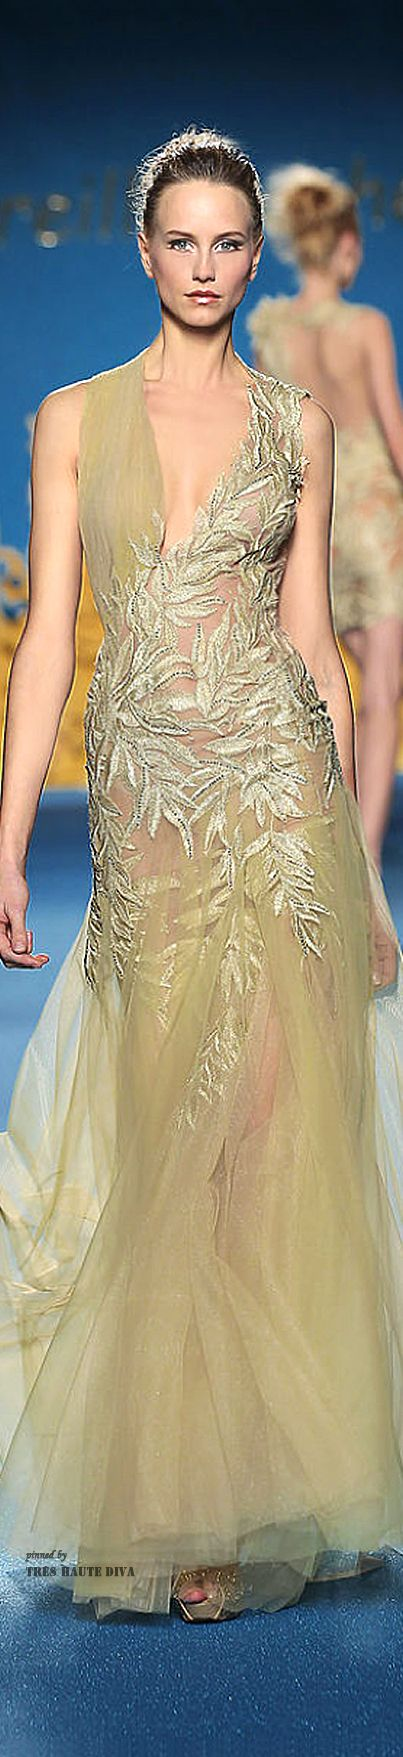 Mireille Dagher ~ Couture Evening Gown, Beige